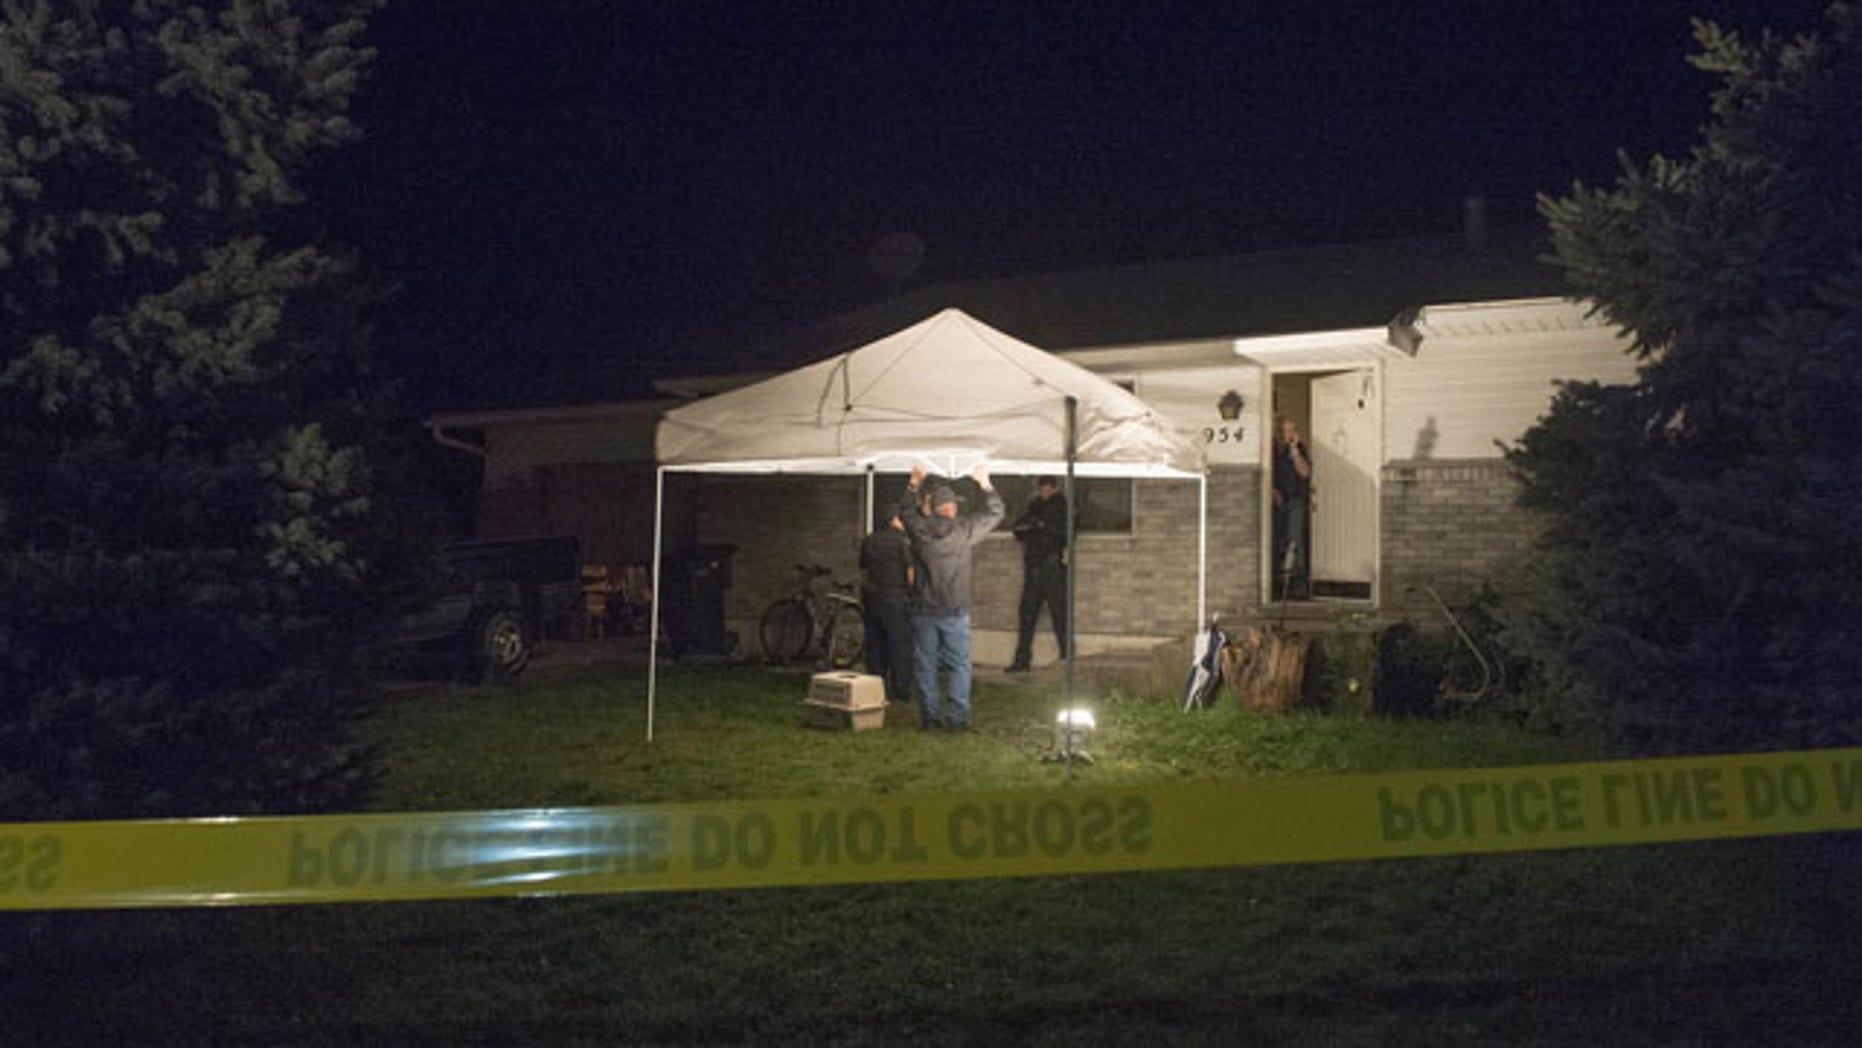 September 27, 2014: Springville Police investigate the scene where five people were found dead in a home in Utah. (AP Photo/The Salt Lake Tribune, Rick Egan)